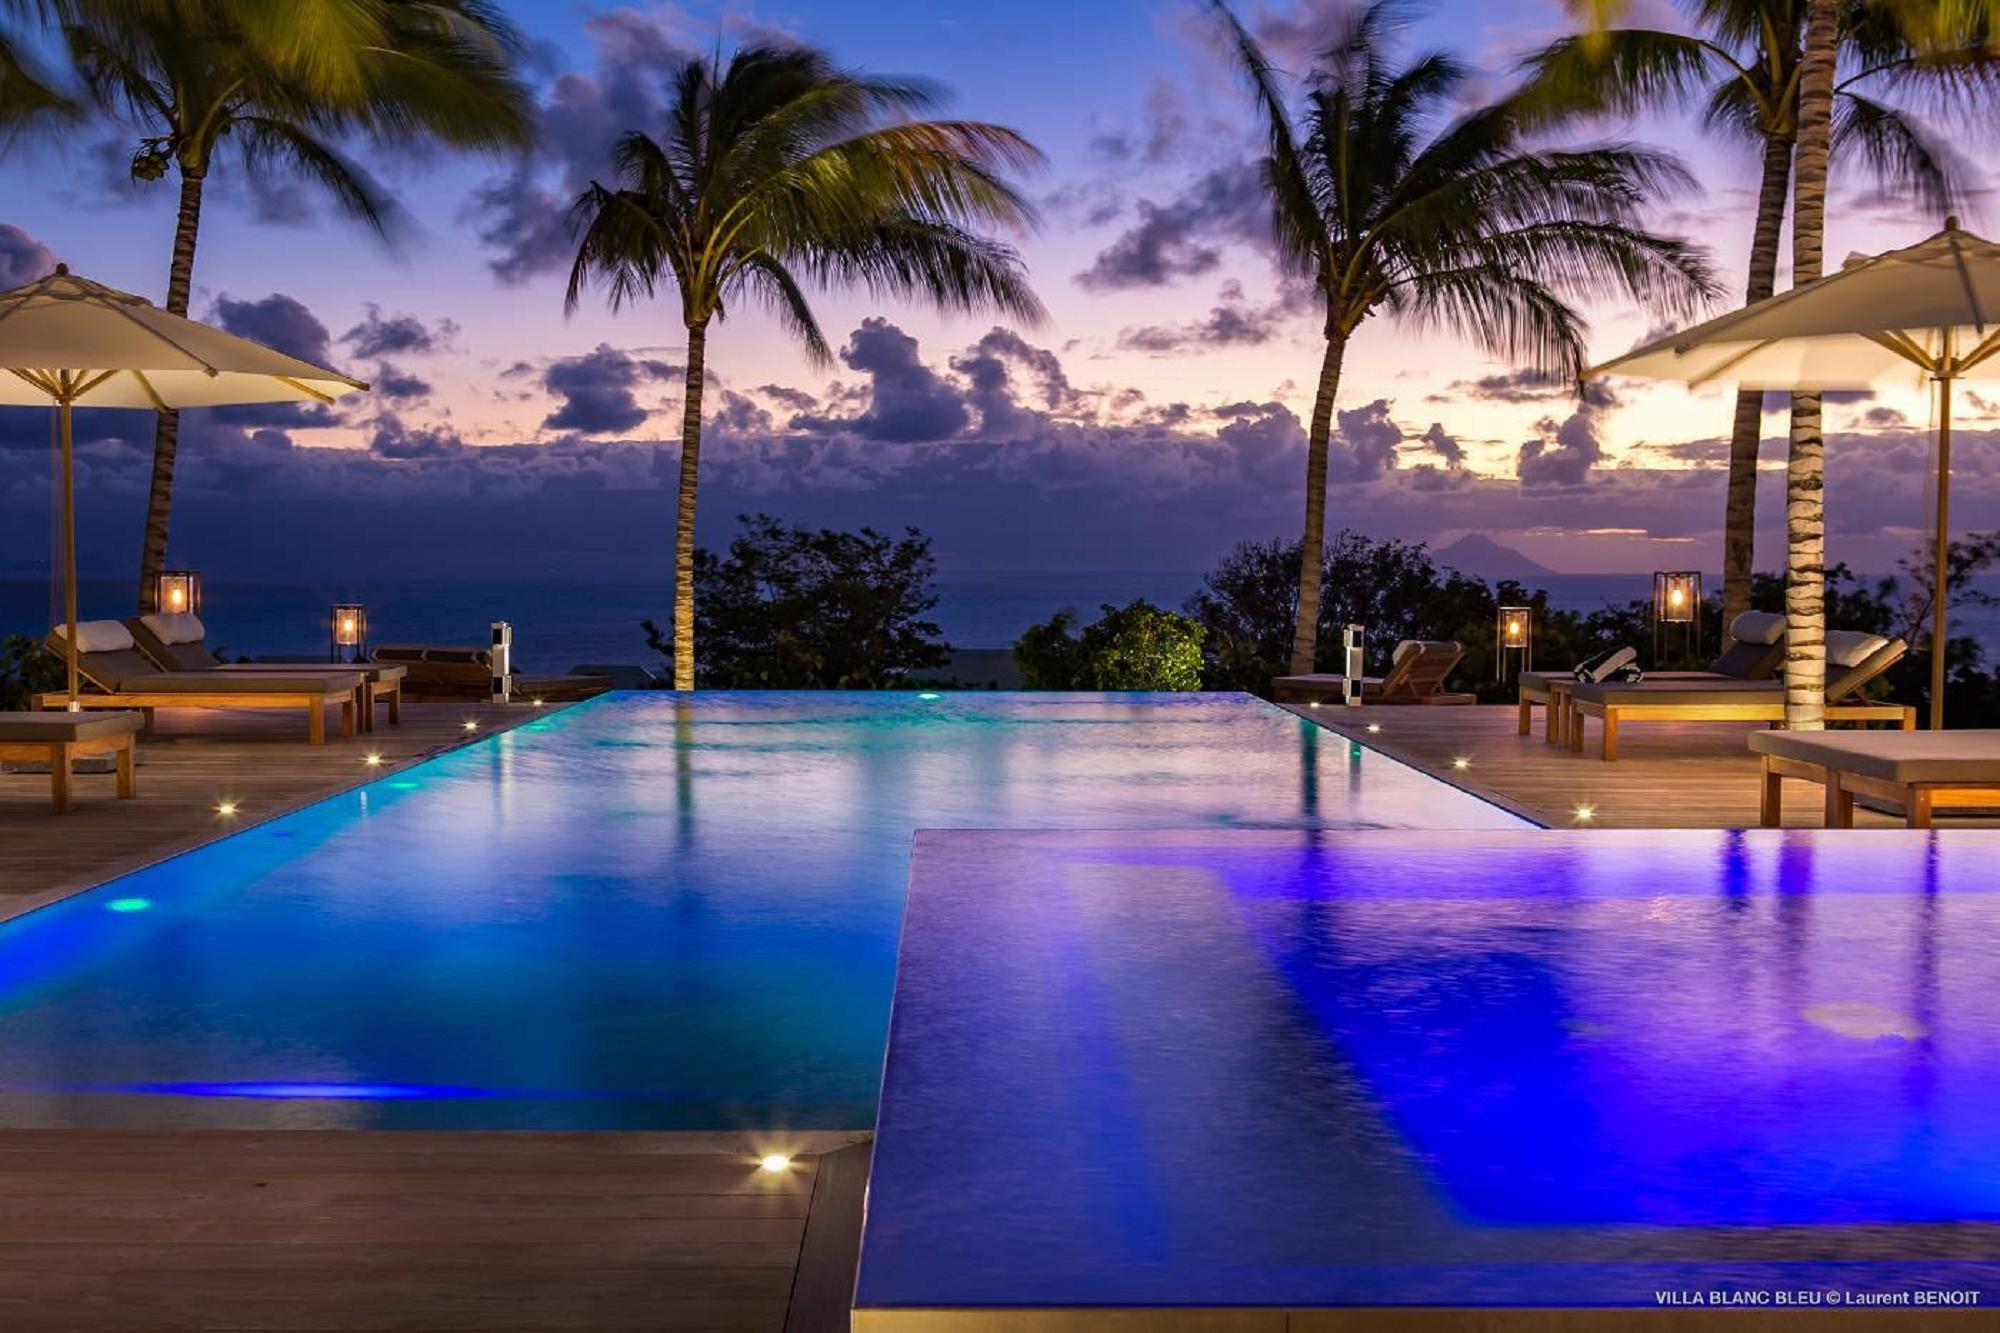 Villa Blanc Bleu 6 BR - Gouverneur, St Barth / St Barth rental For Super Rich